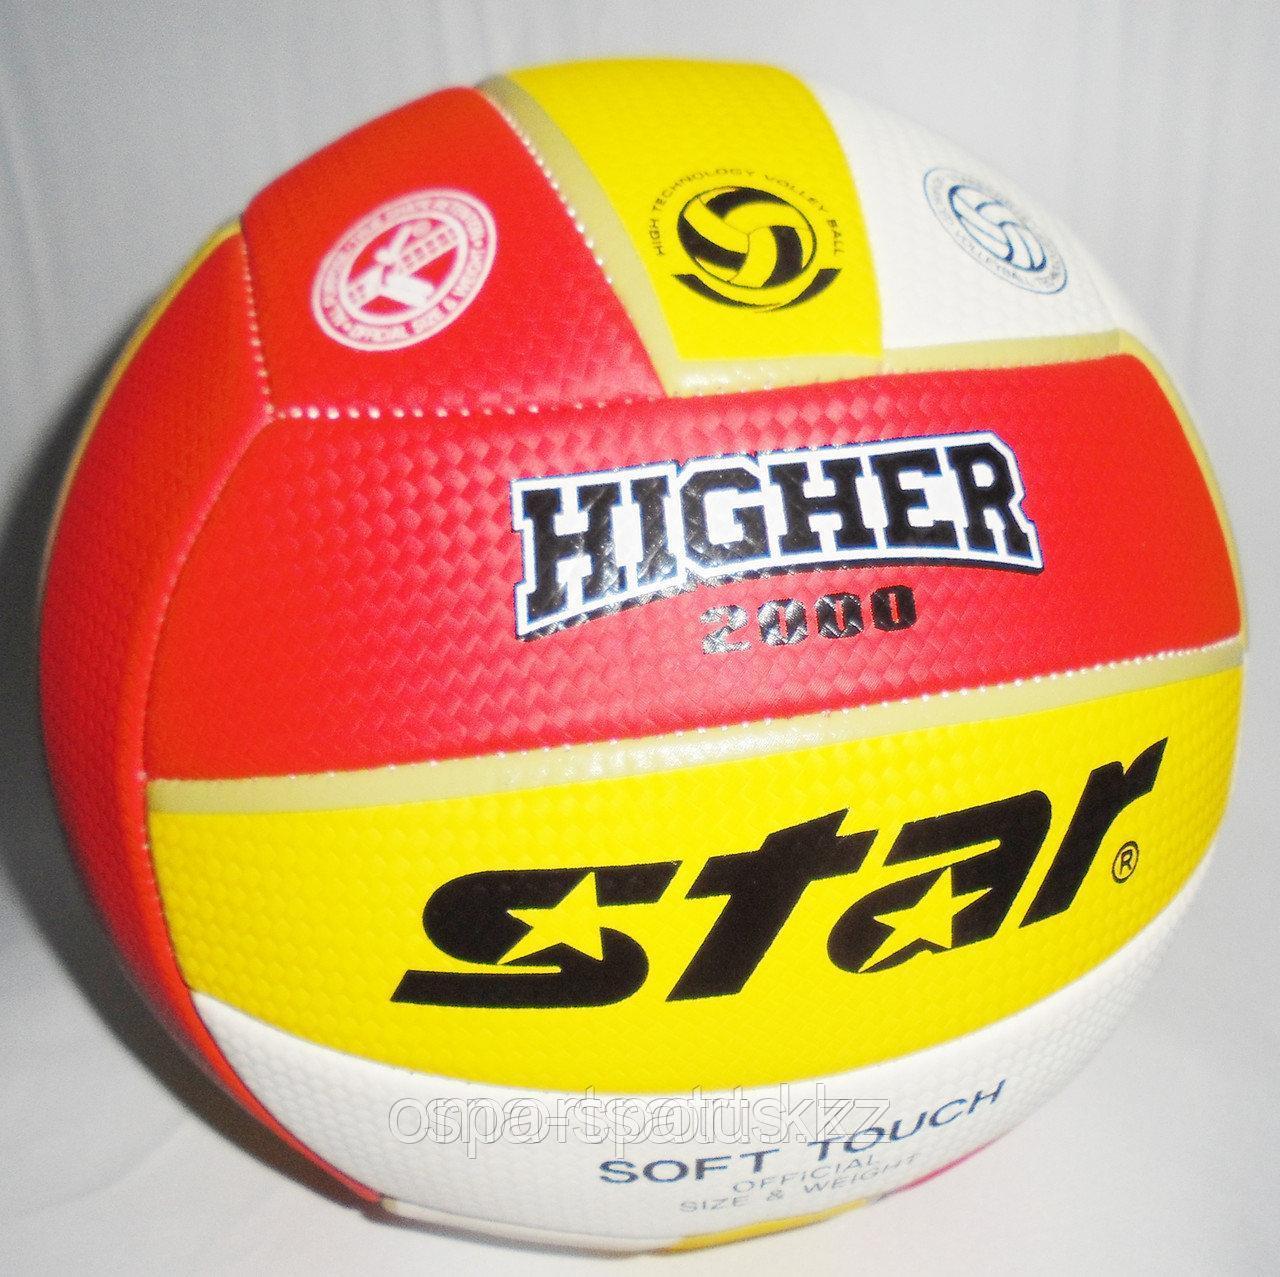 Мяч Воллейбольный STAR HIGHER 2000 VB 805